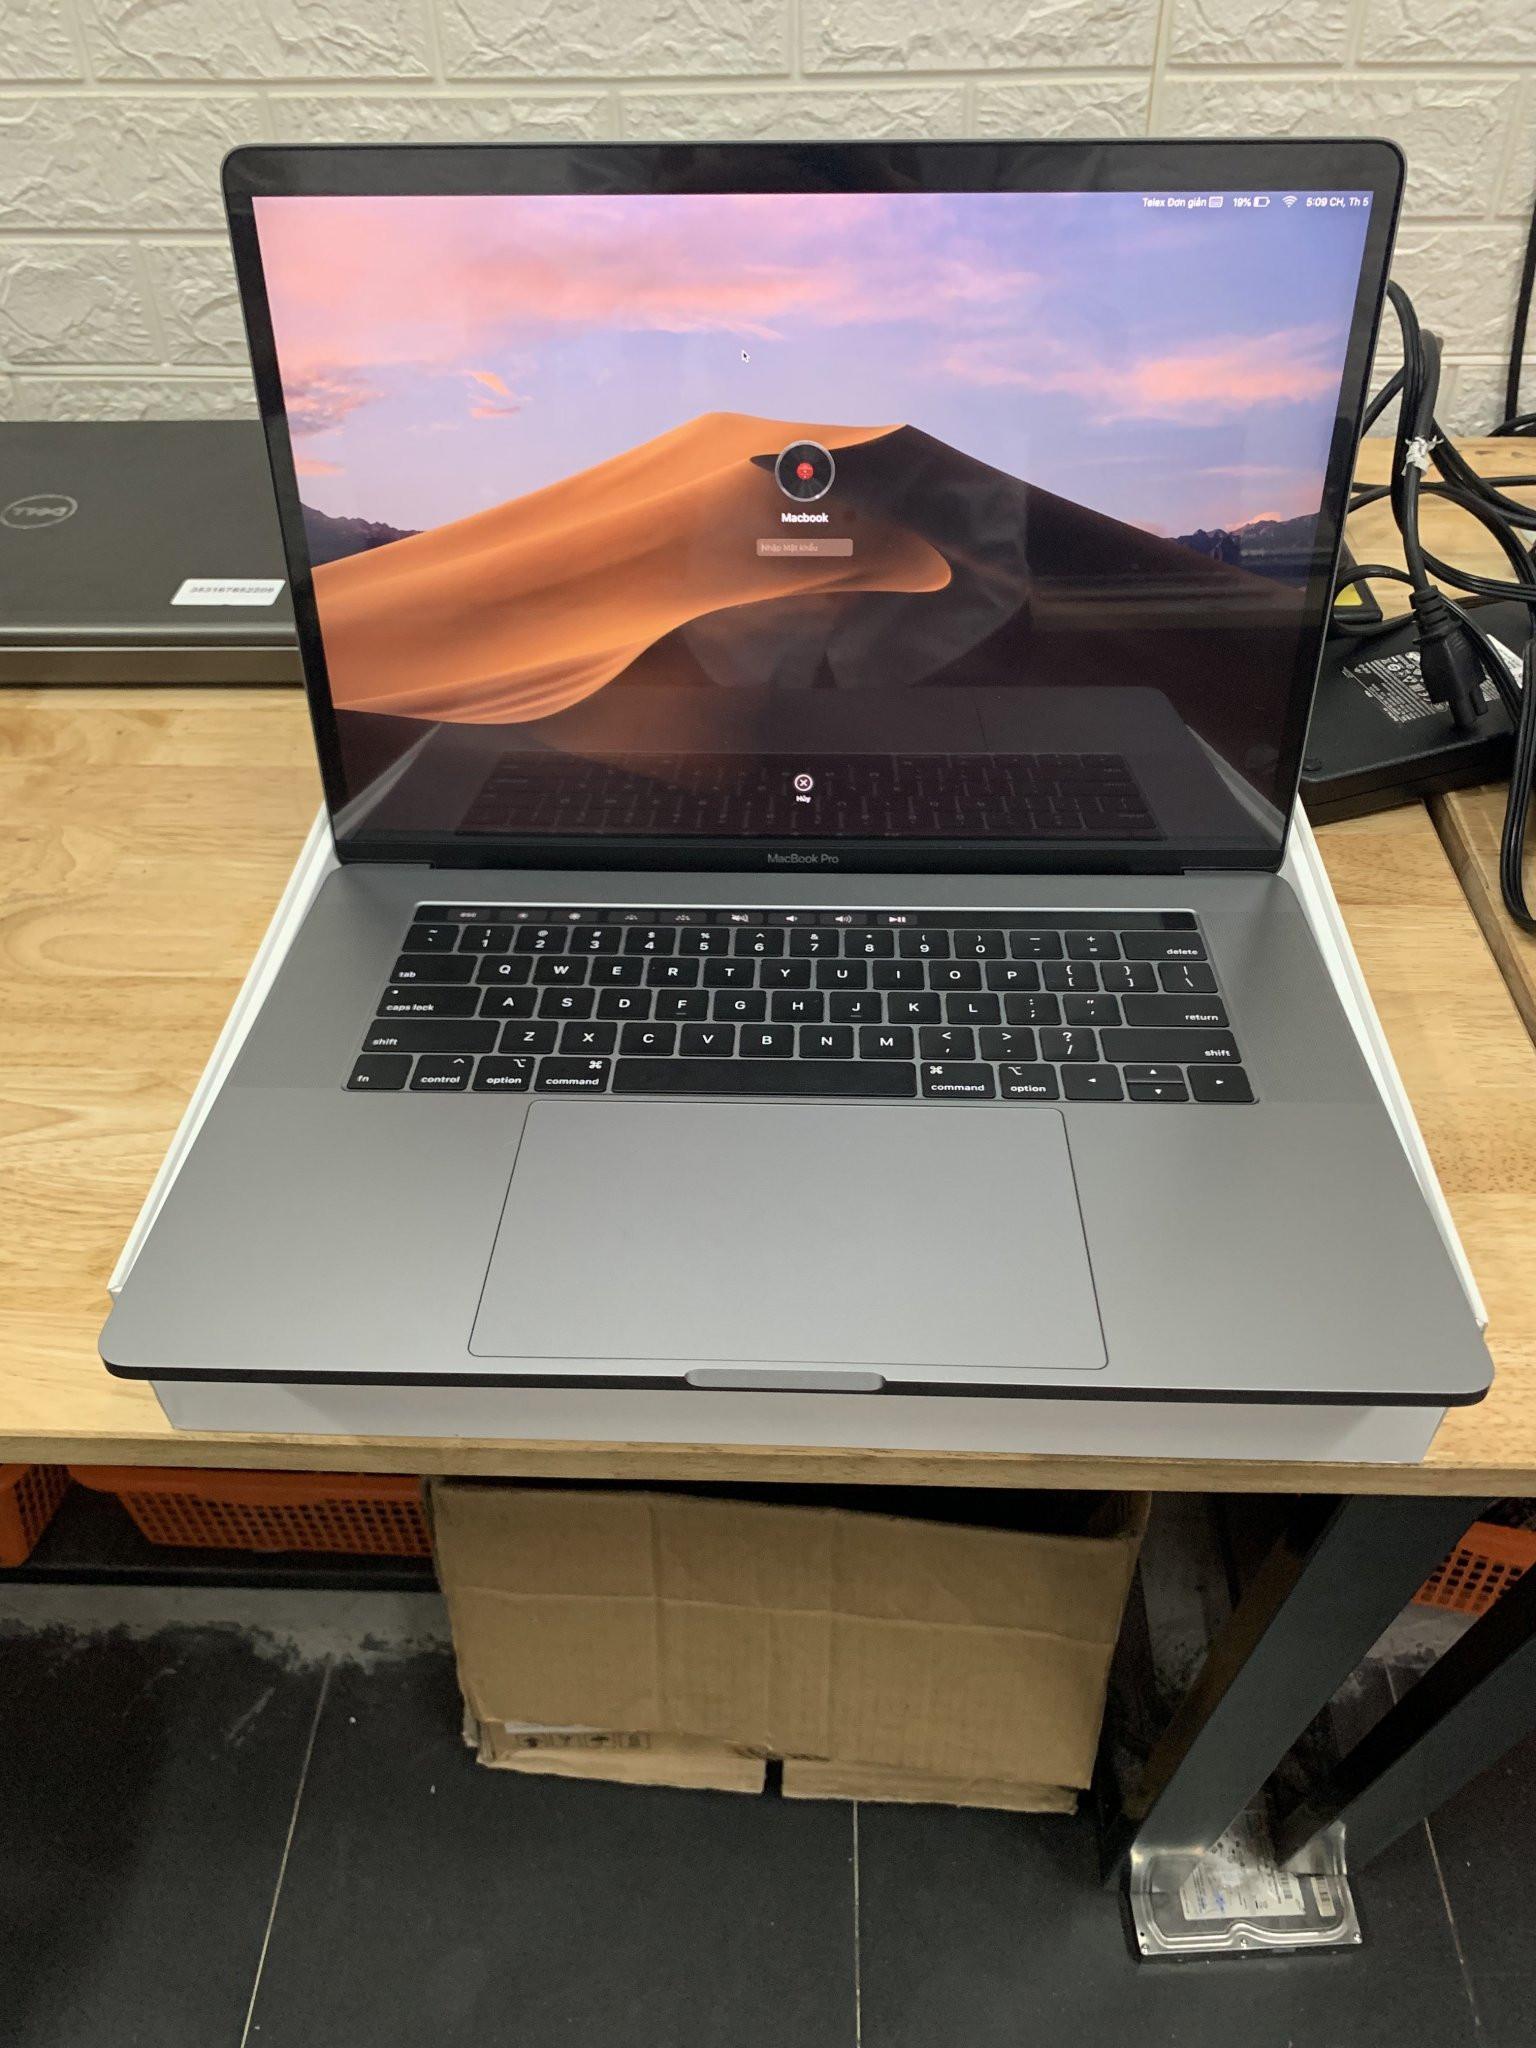 "Macbook Pro 2017 15"", Core i7/16GB/512GB"